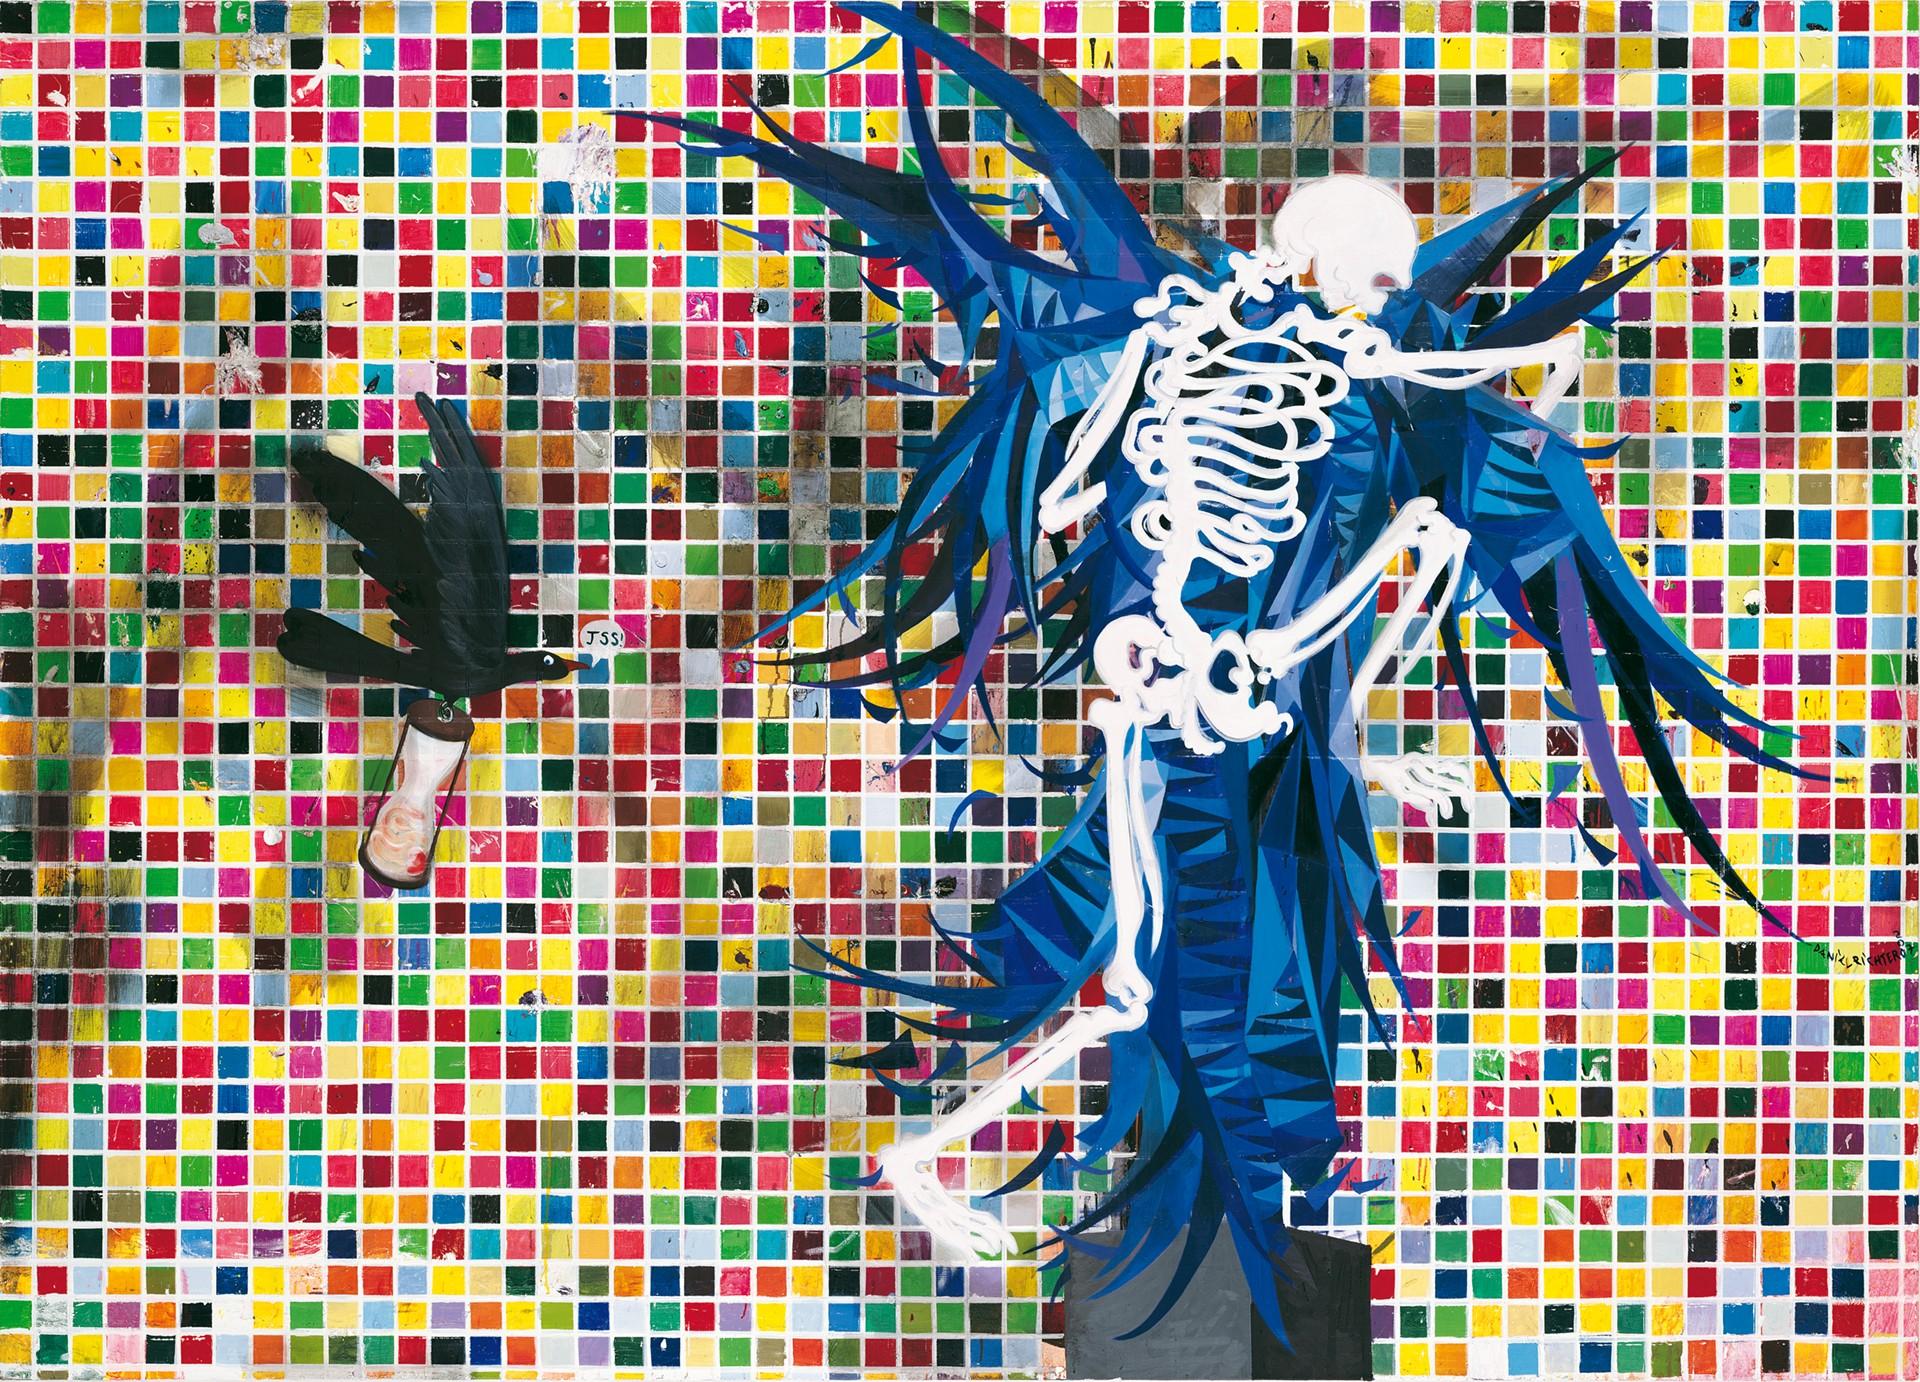 Foto: Tatintsian Collection © Jochen Littkemann, Berlin / © Bildrecht, Wien 2017   Header Image:Secession, Albertina, 21er Haus -Three very interesting venues are showing three different exhibitions. Spacial installations. Photography. Painting.